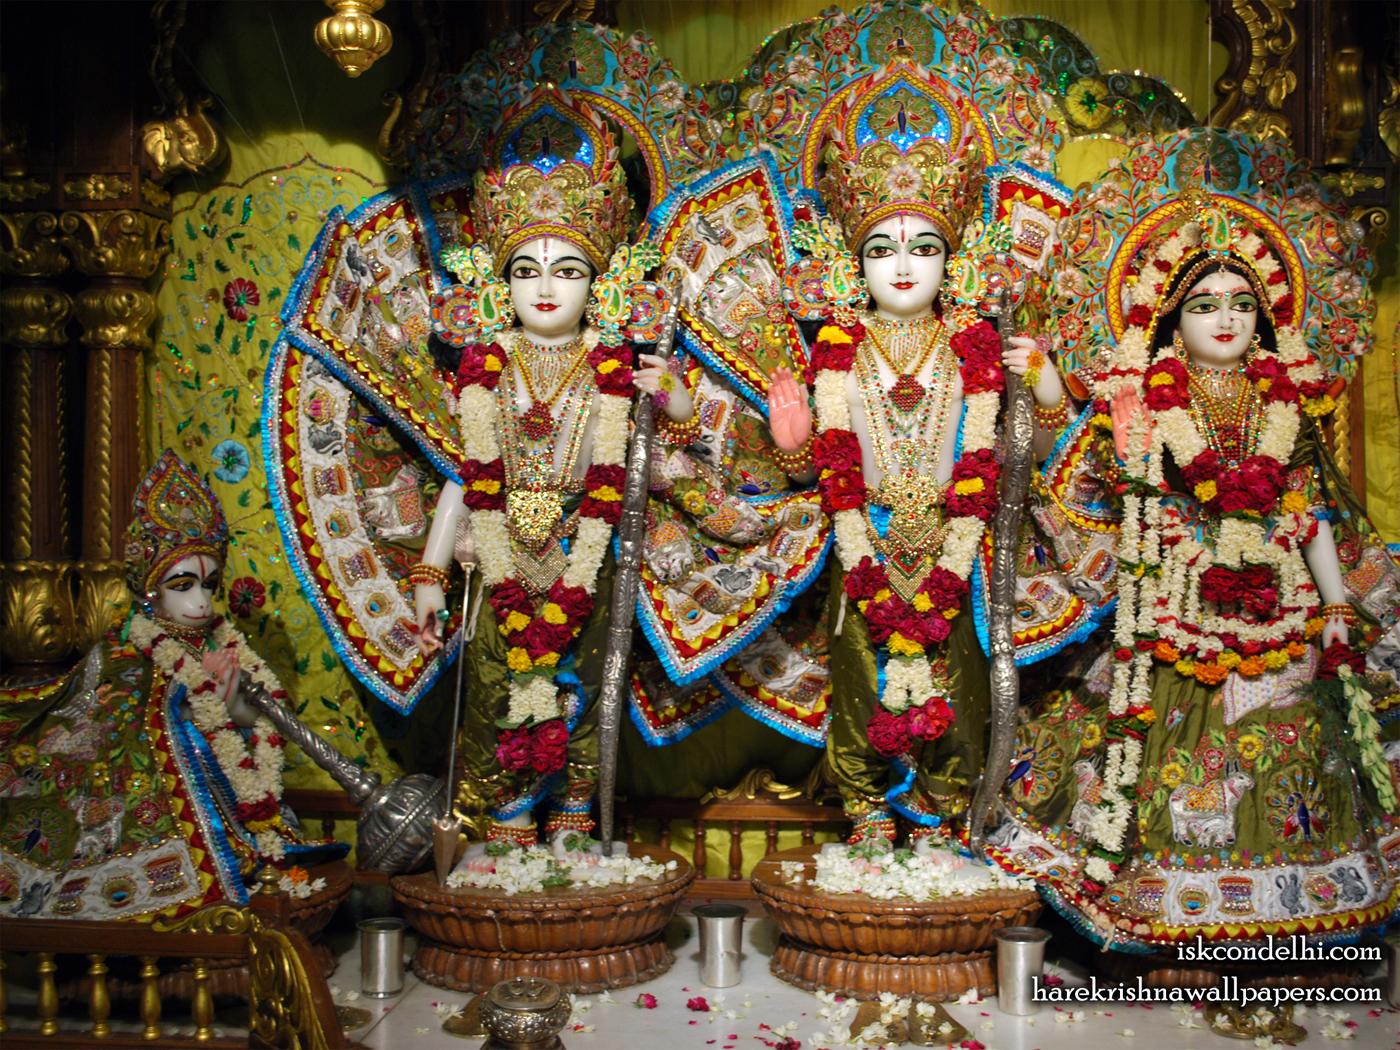 Sri Sri Sita Rama Laxman Hanuman Wallpaper (014) Size 1400x1050 Download